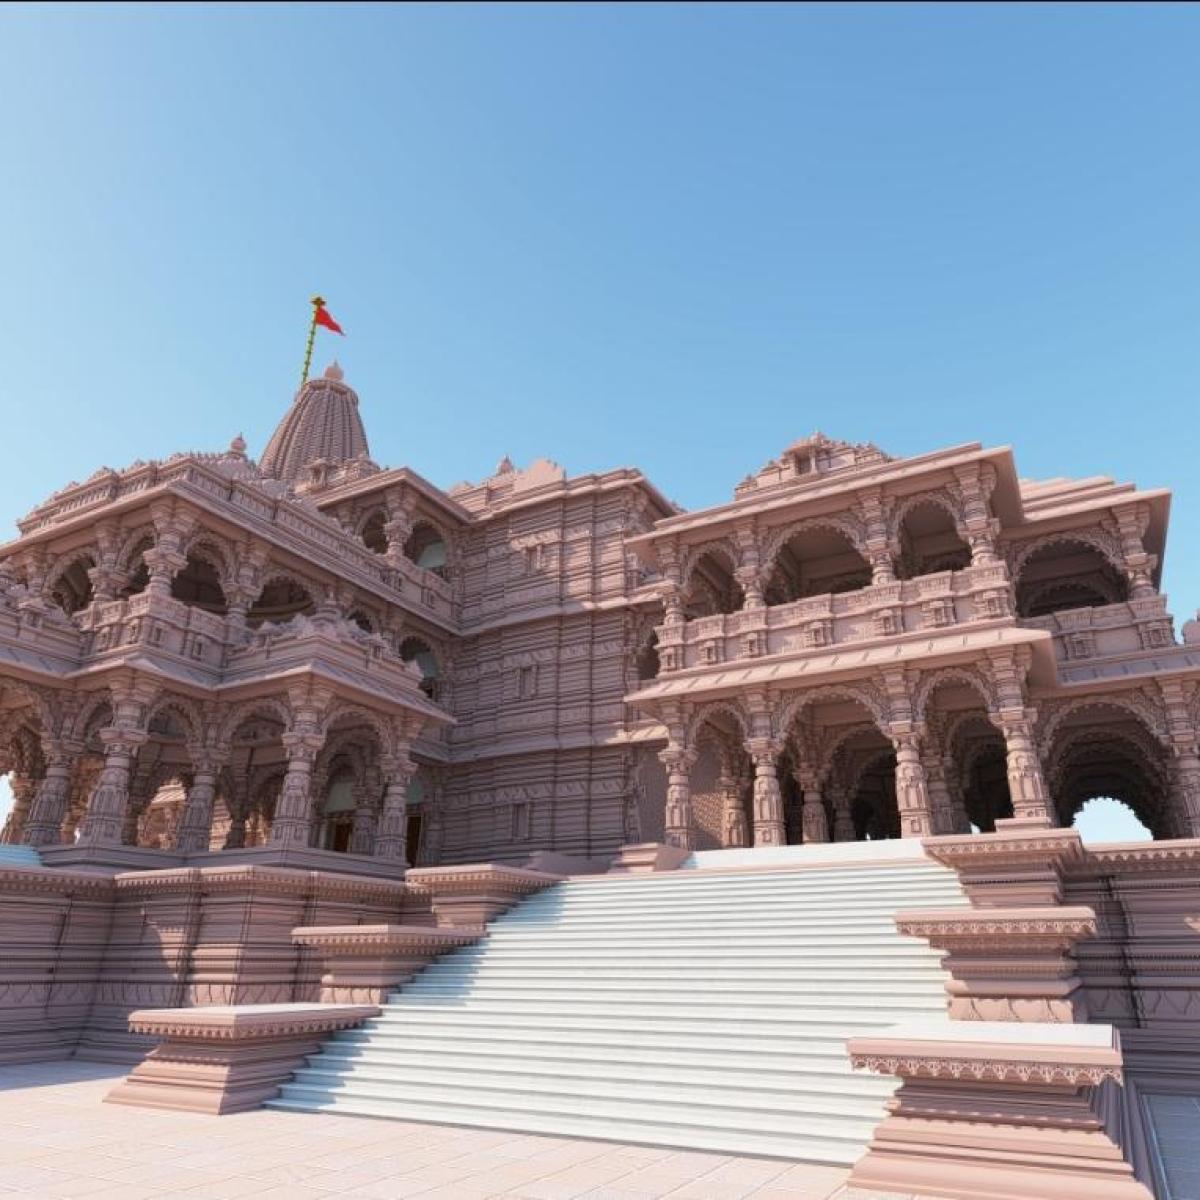 Uttar Pradesh: Ram Mandir trust to hold symbolic celebration at makeshift temple on Ram Navami; no devotees allowed amid COVID-19